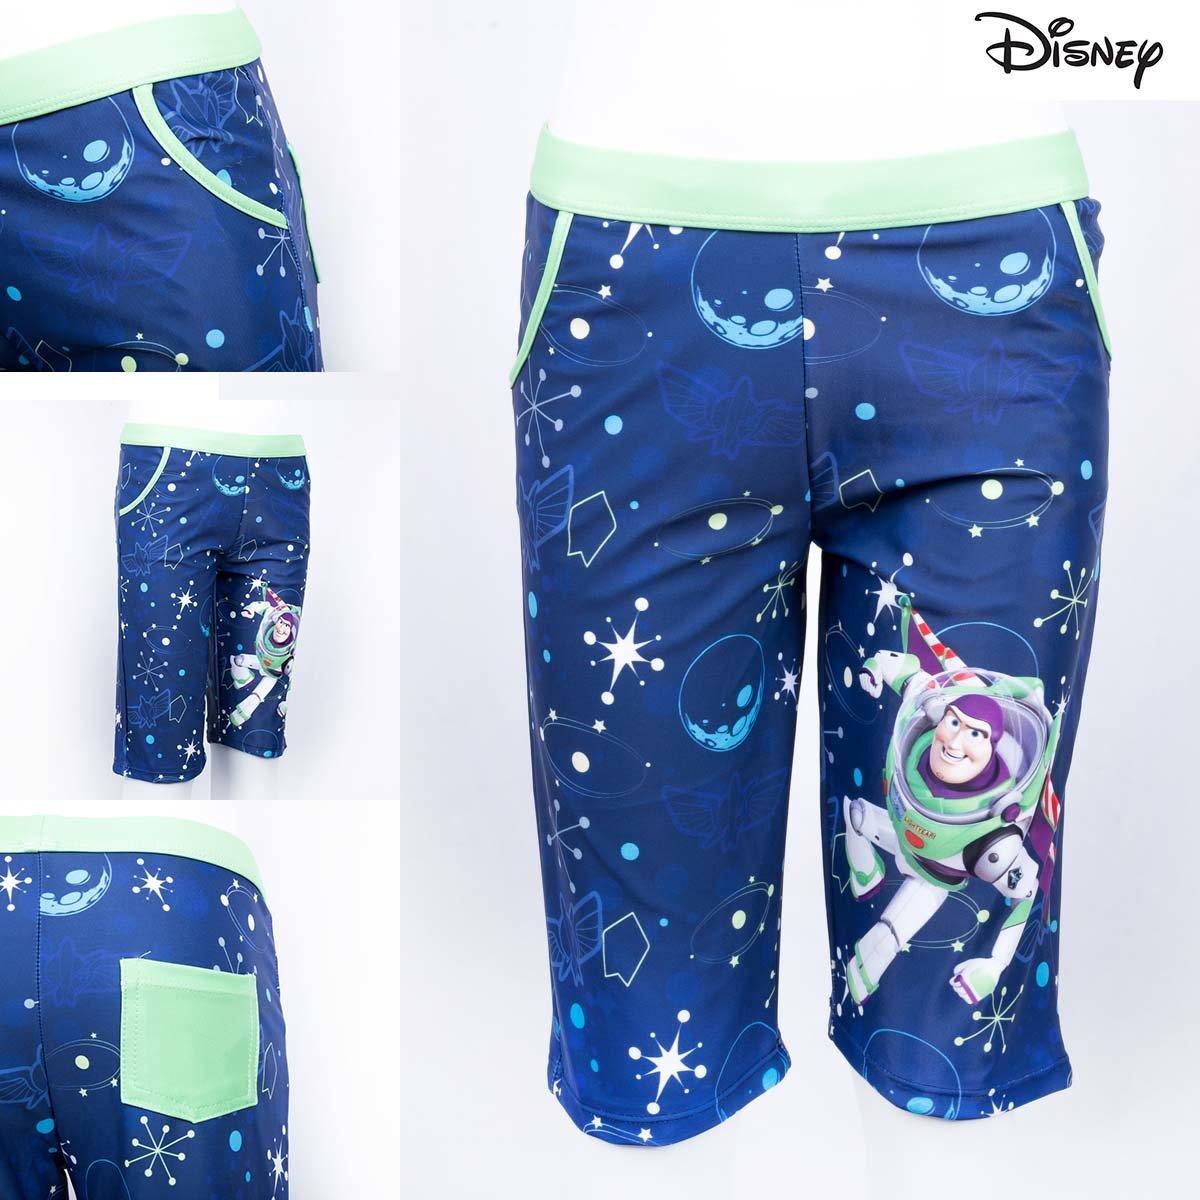 Disney | Boy's Loose Swim Pants (Toy Story - Buzz Lightyear